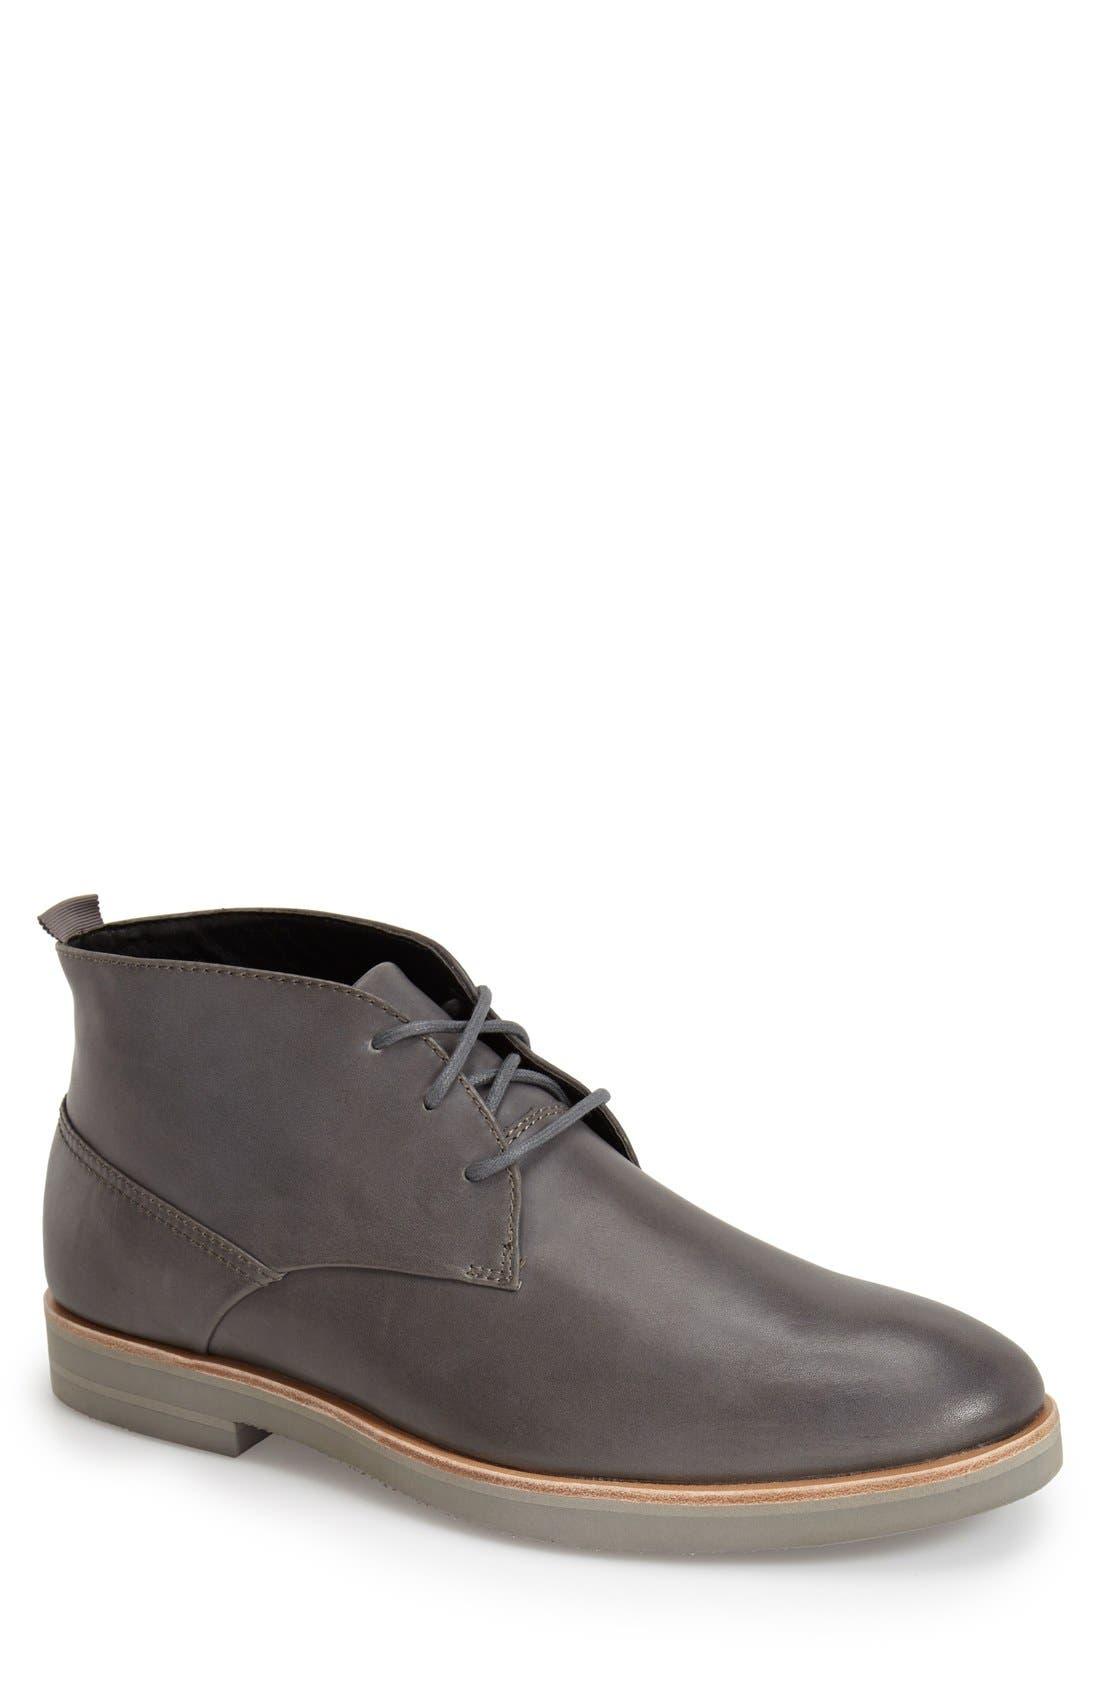 Alternate Image 1 Selected - Calvin Klein 'Walter' Chukka Boot (Men)